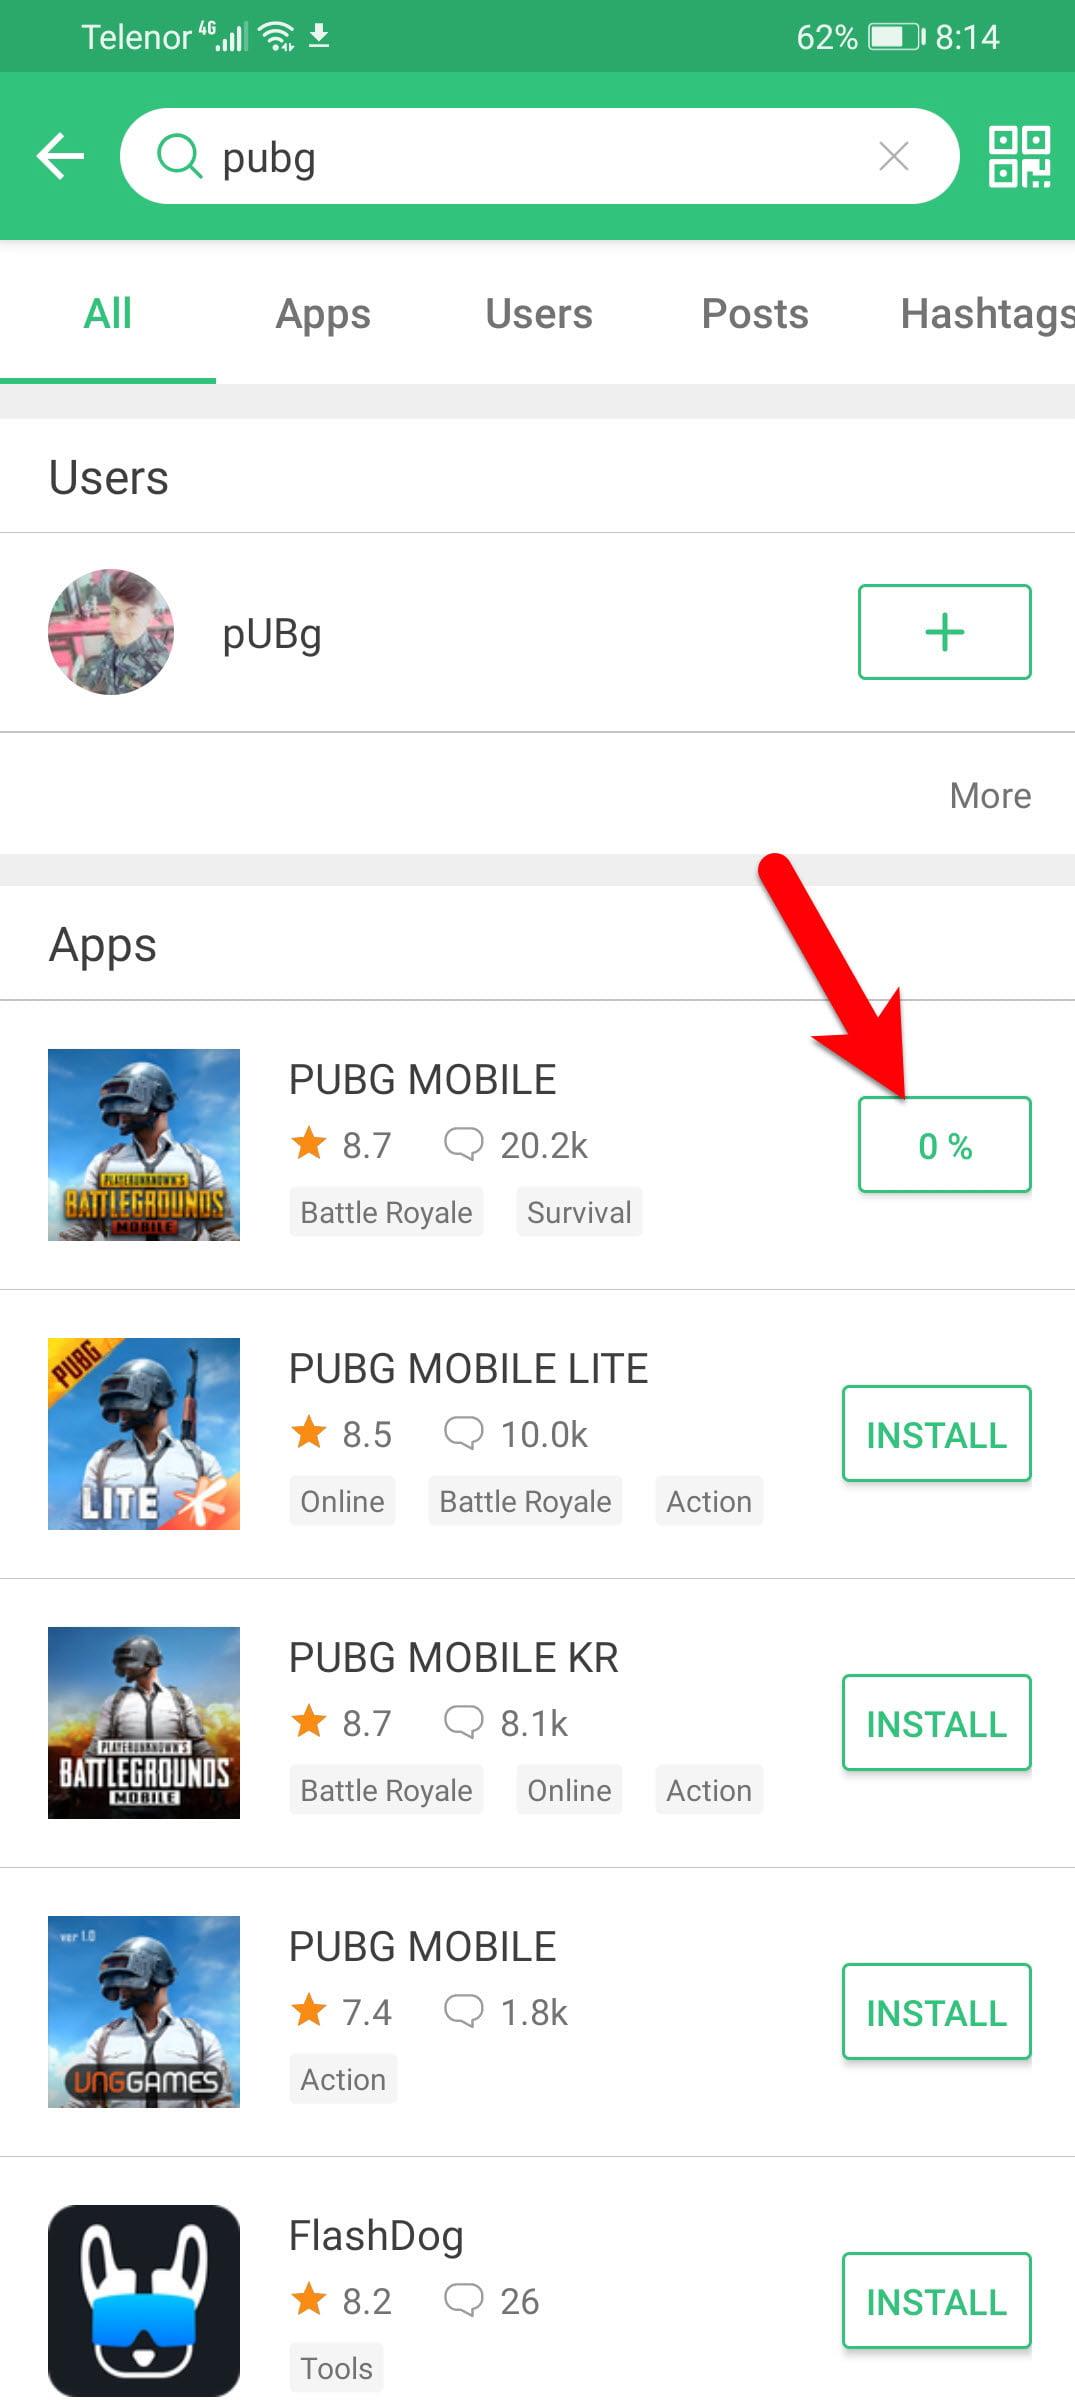 Downloading PUBG